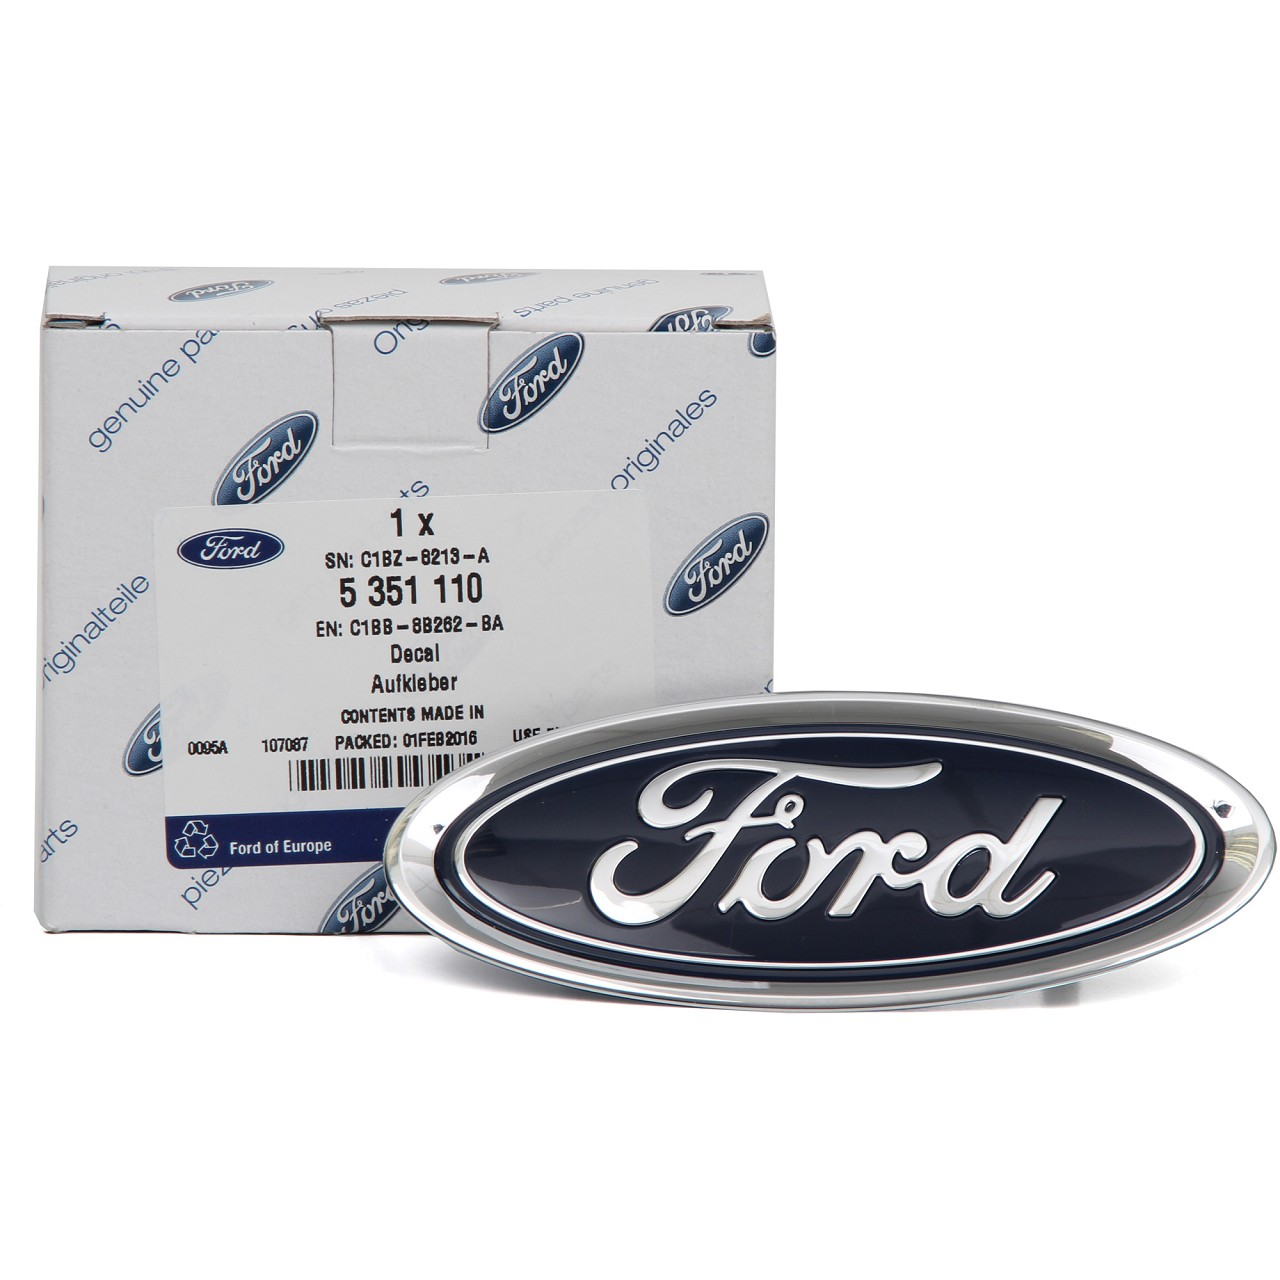 ORIGINAL Ford Emblem Plakette Logo Wappen C-Max II Focus III vorne 5351110